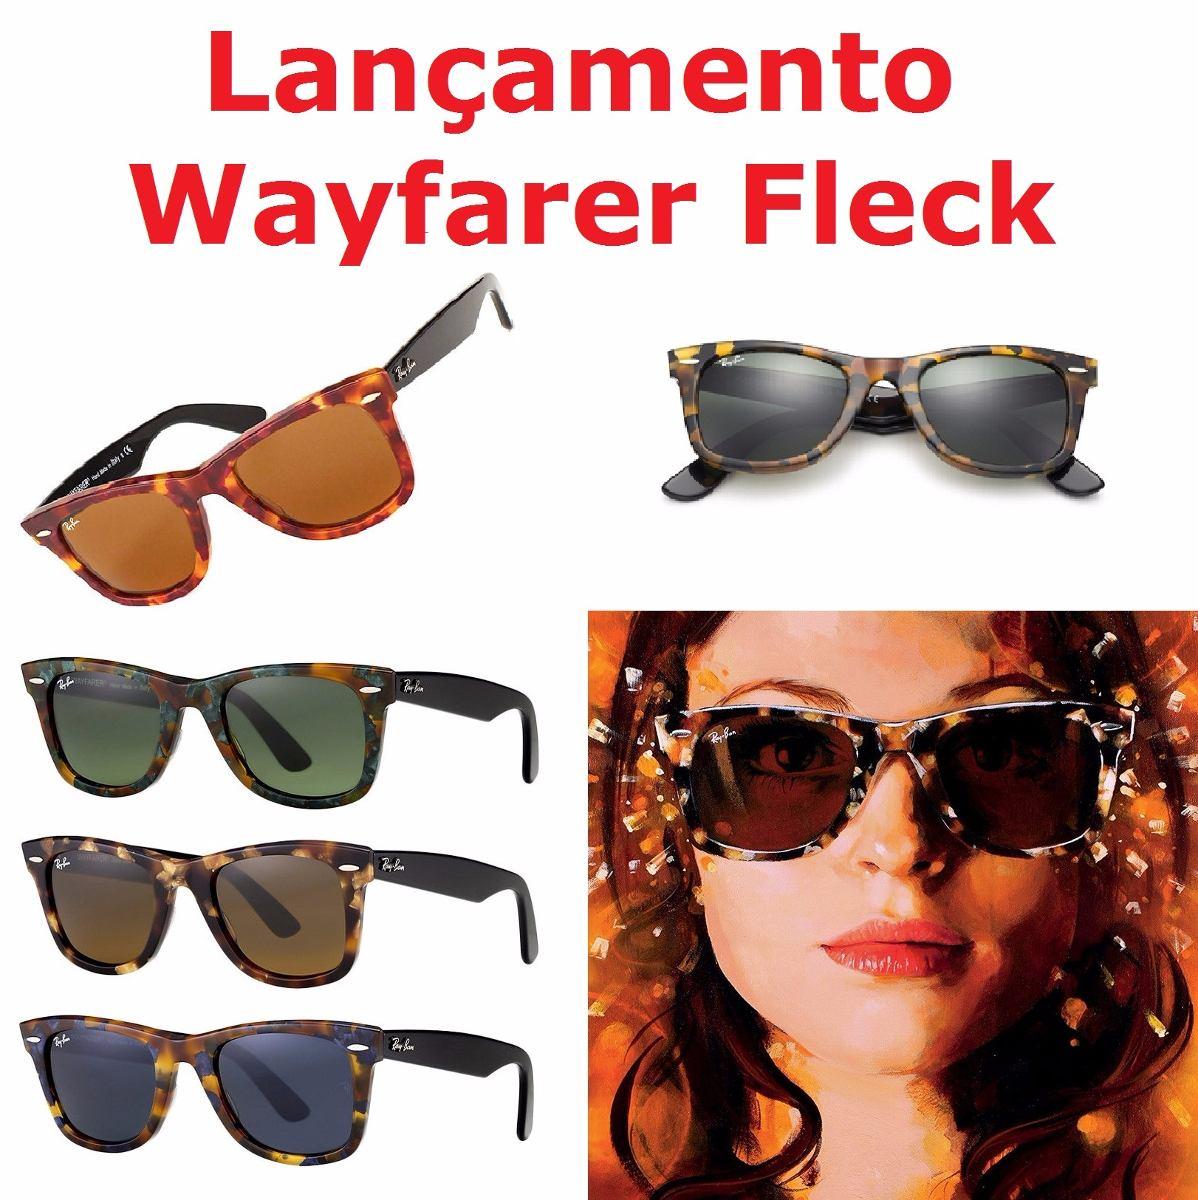 Ray Ban Wayfarer 2140 Mercado Livre « Heritage Malta 5ede306b55